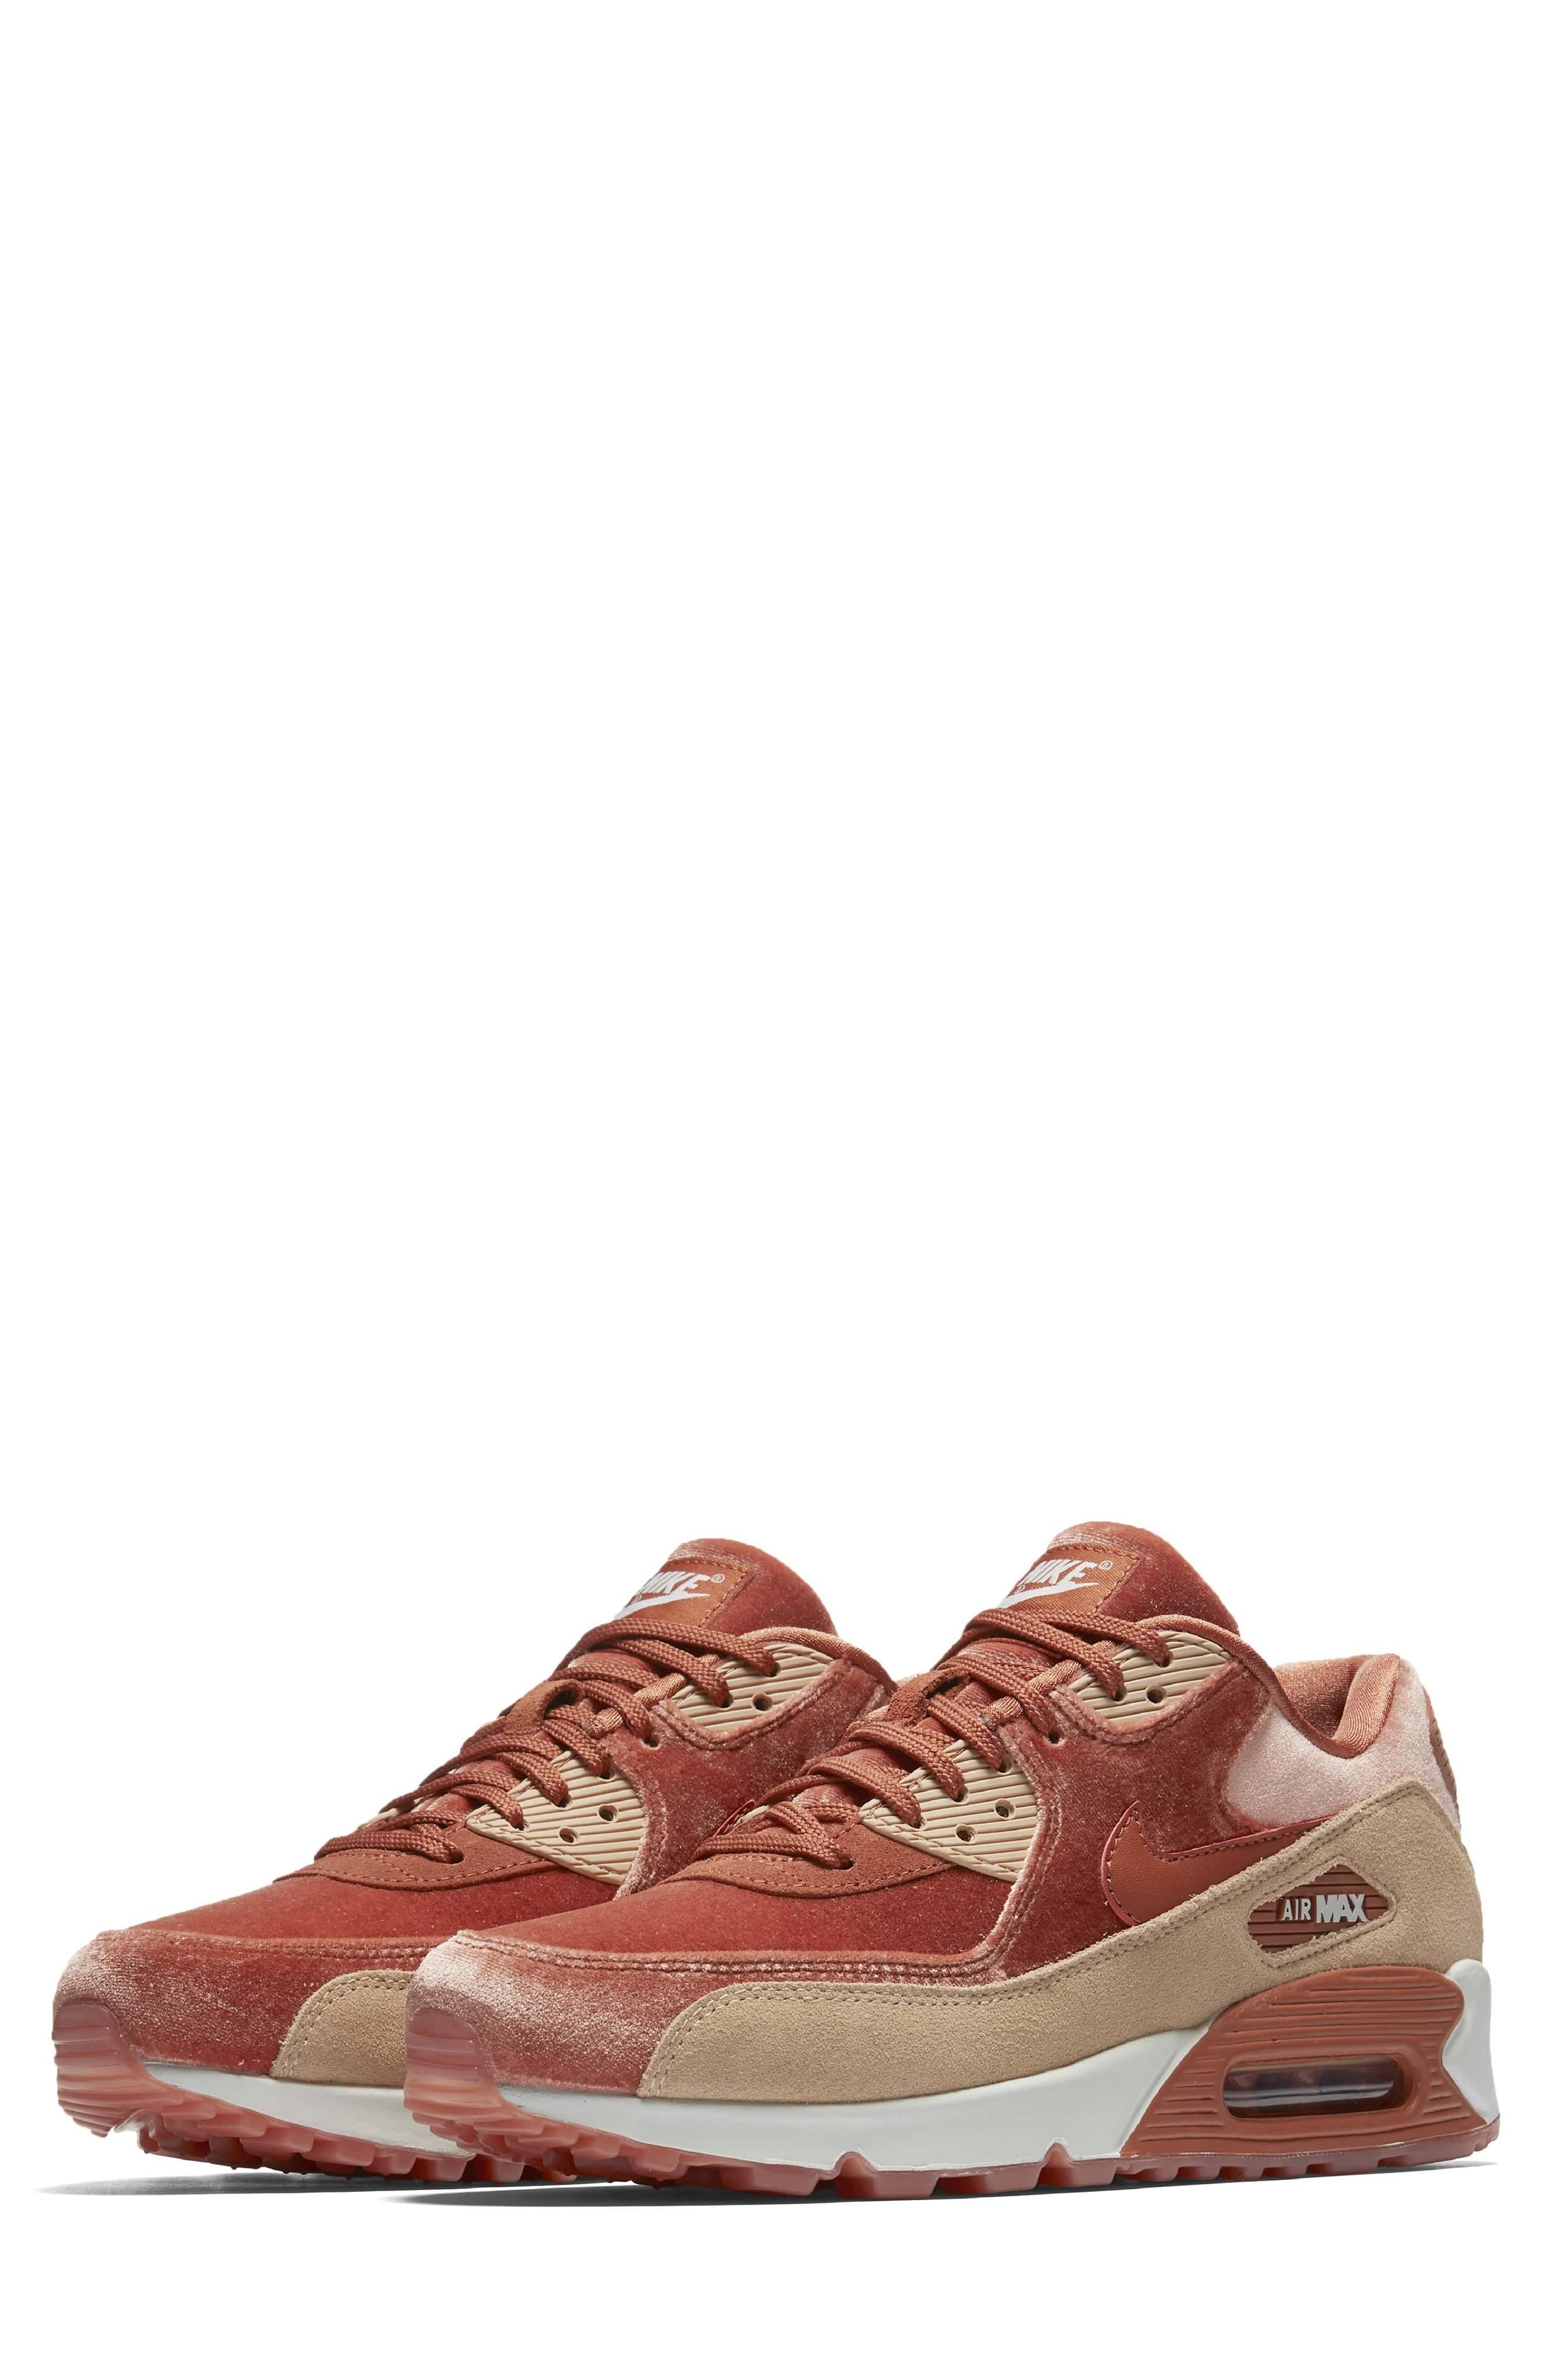 new arrival 0eace bf89f Nike Air Max 90 Lx Sneaker In Dusty Peach  Dusty Peach